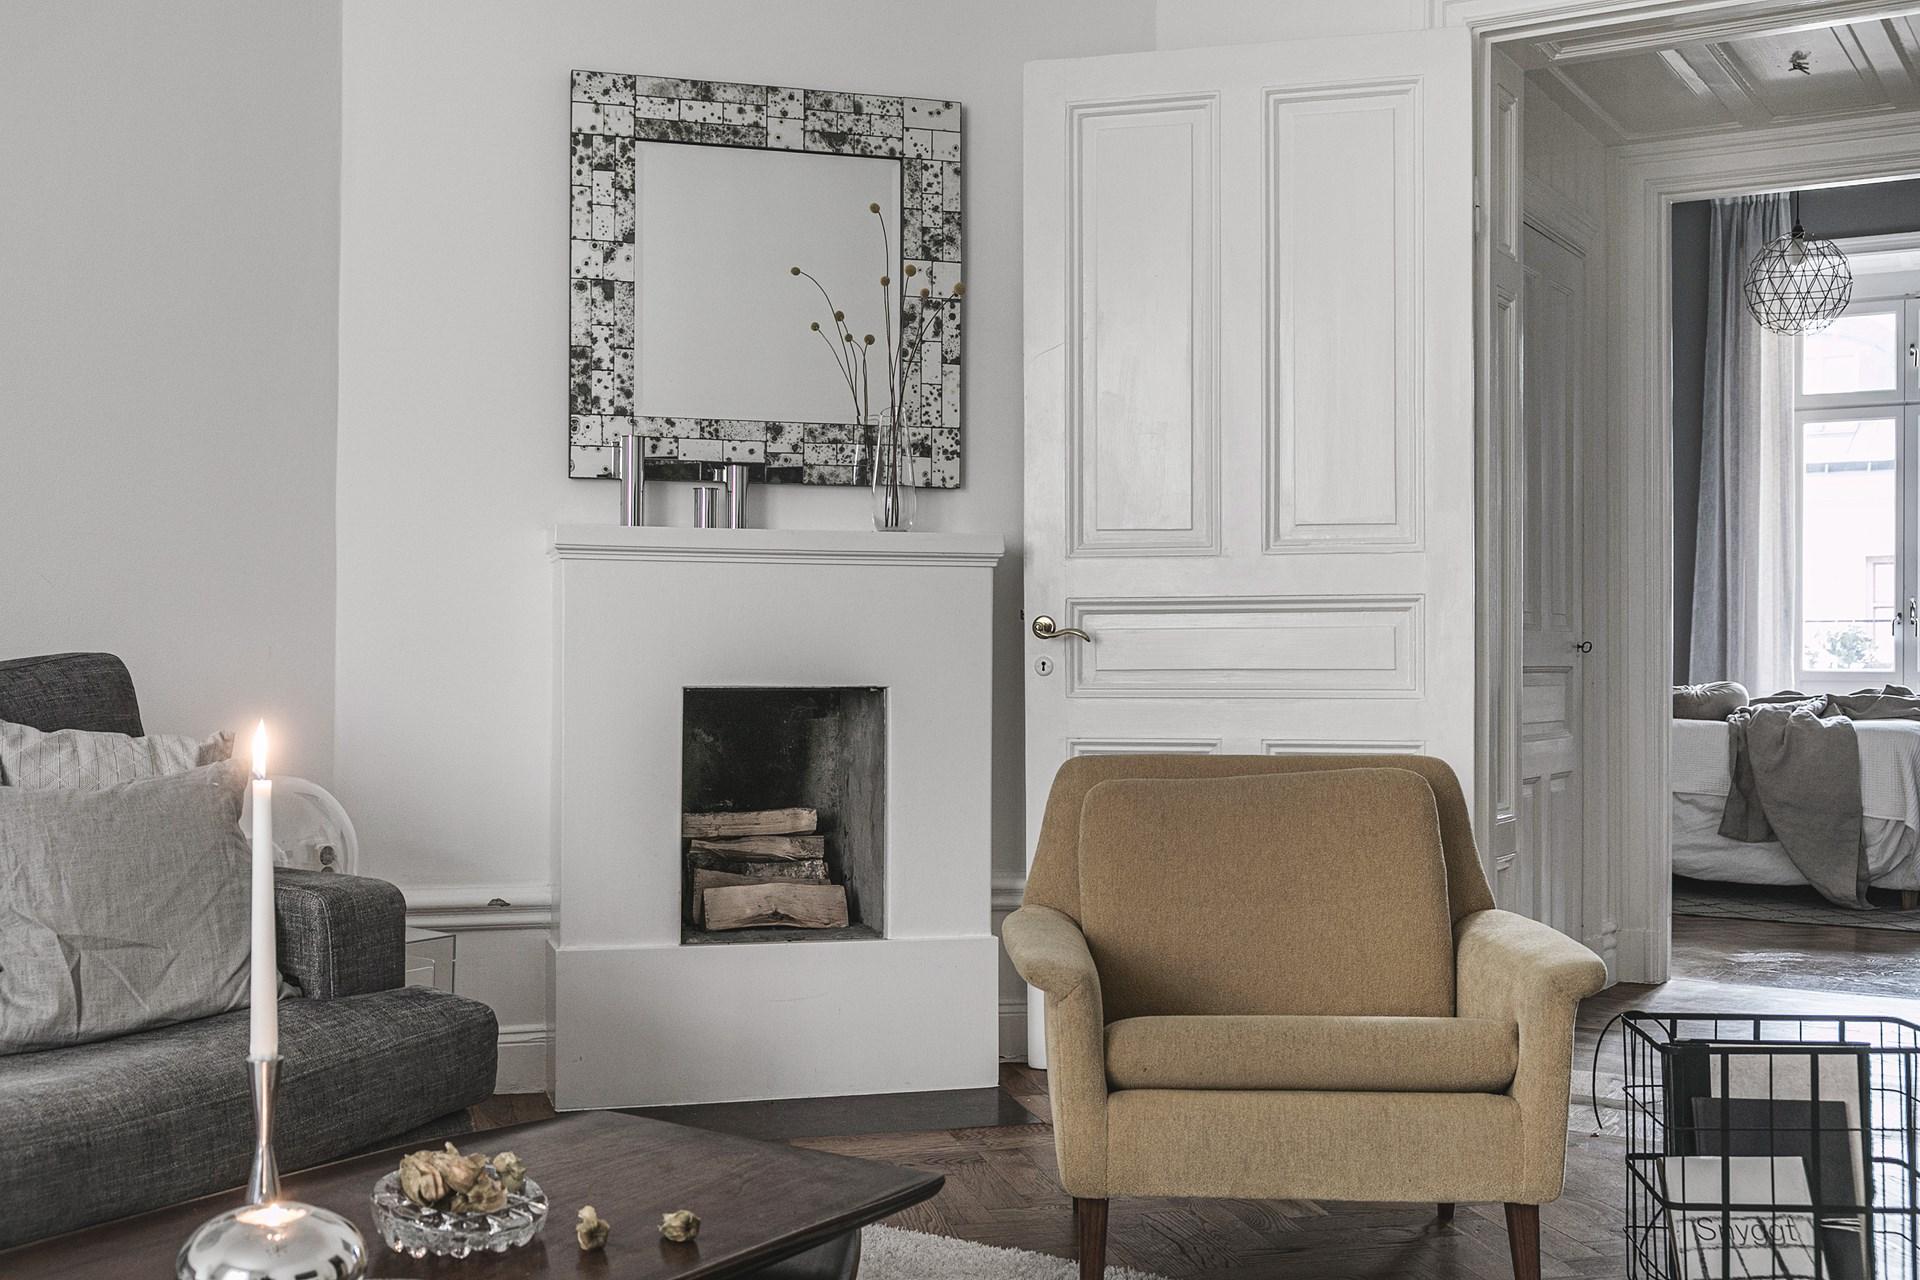 квартира 89 квм гостиная камин кресло